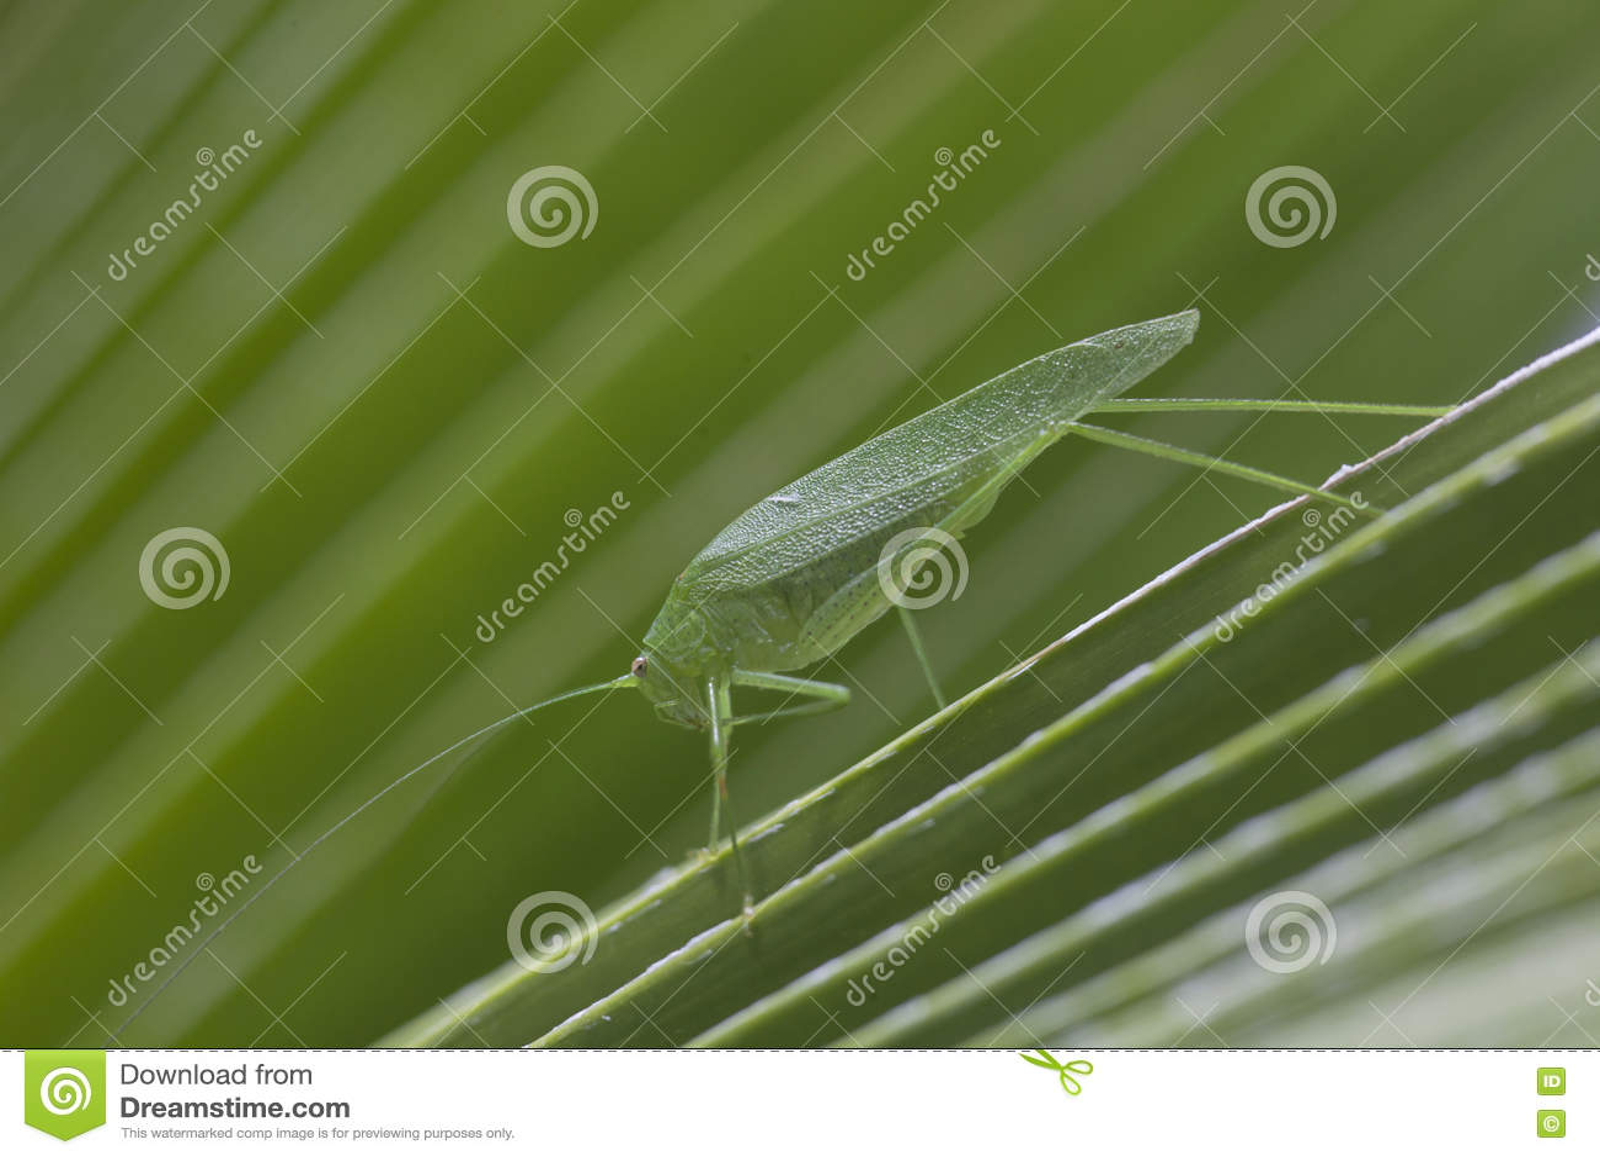 Giant Katydid Long Legged Green Leaf Grass Hopper Stock ...